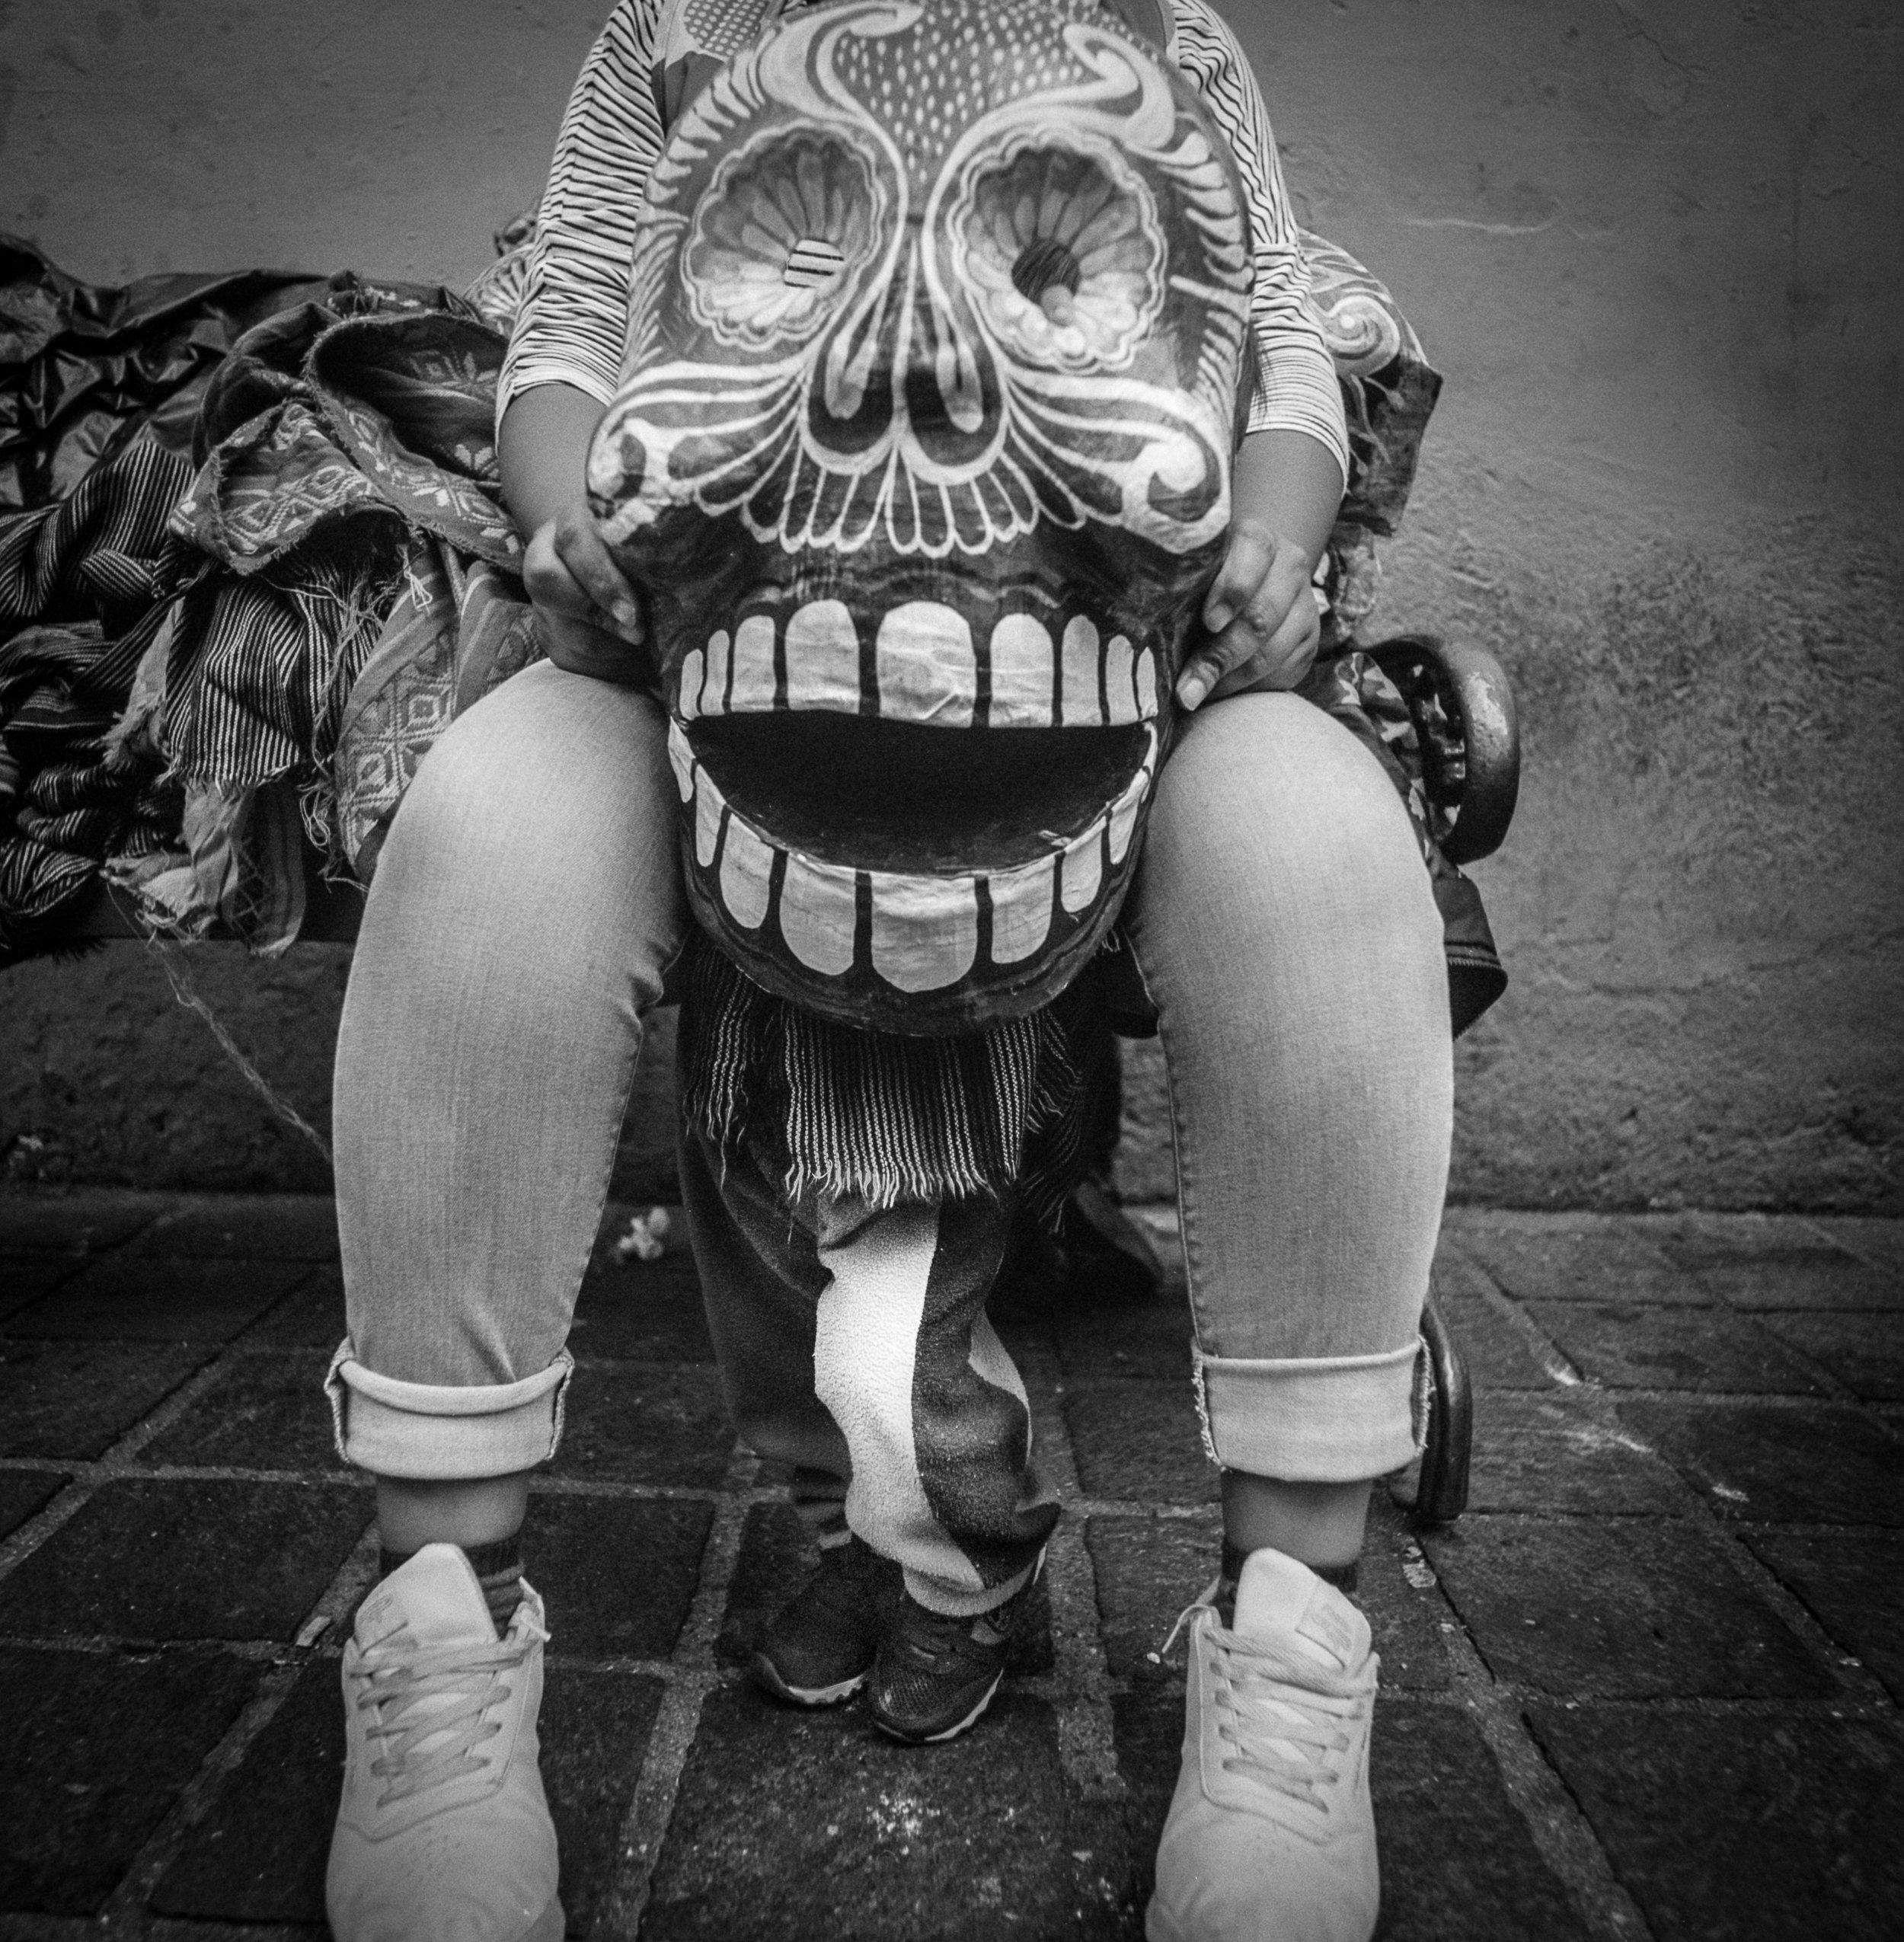 ©Kevin Greenblat, Guanajuato, 2018